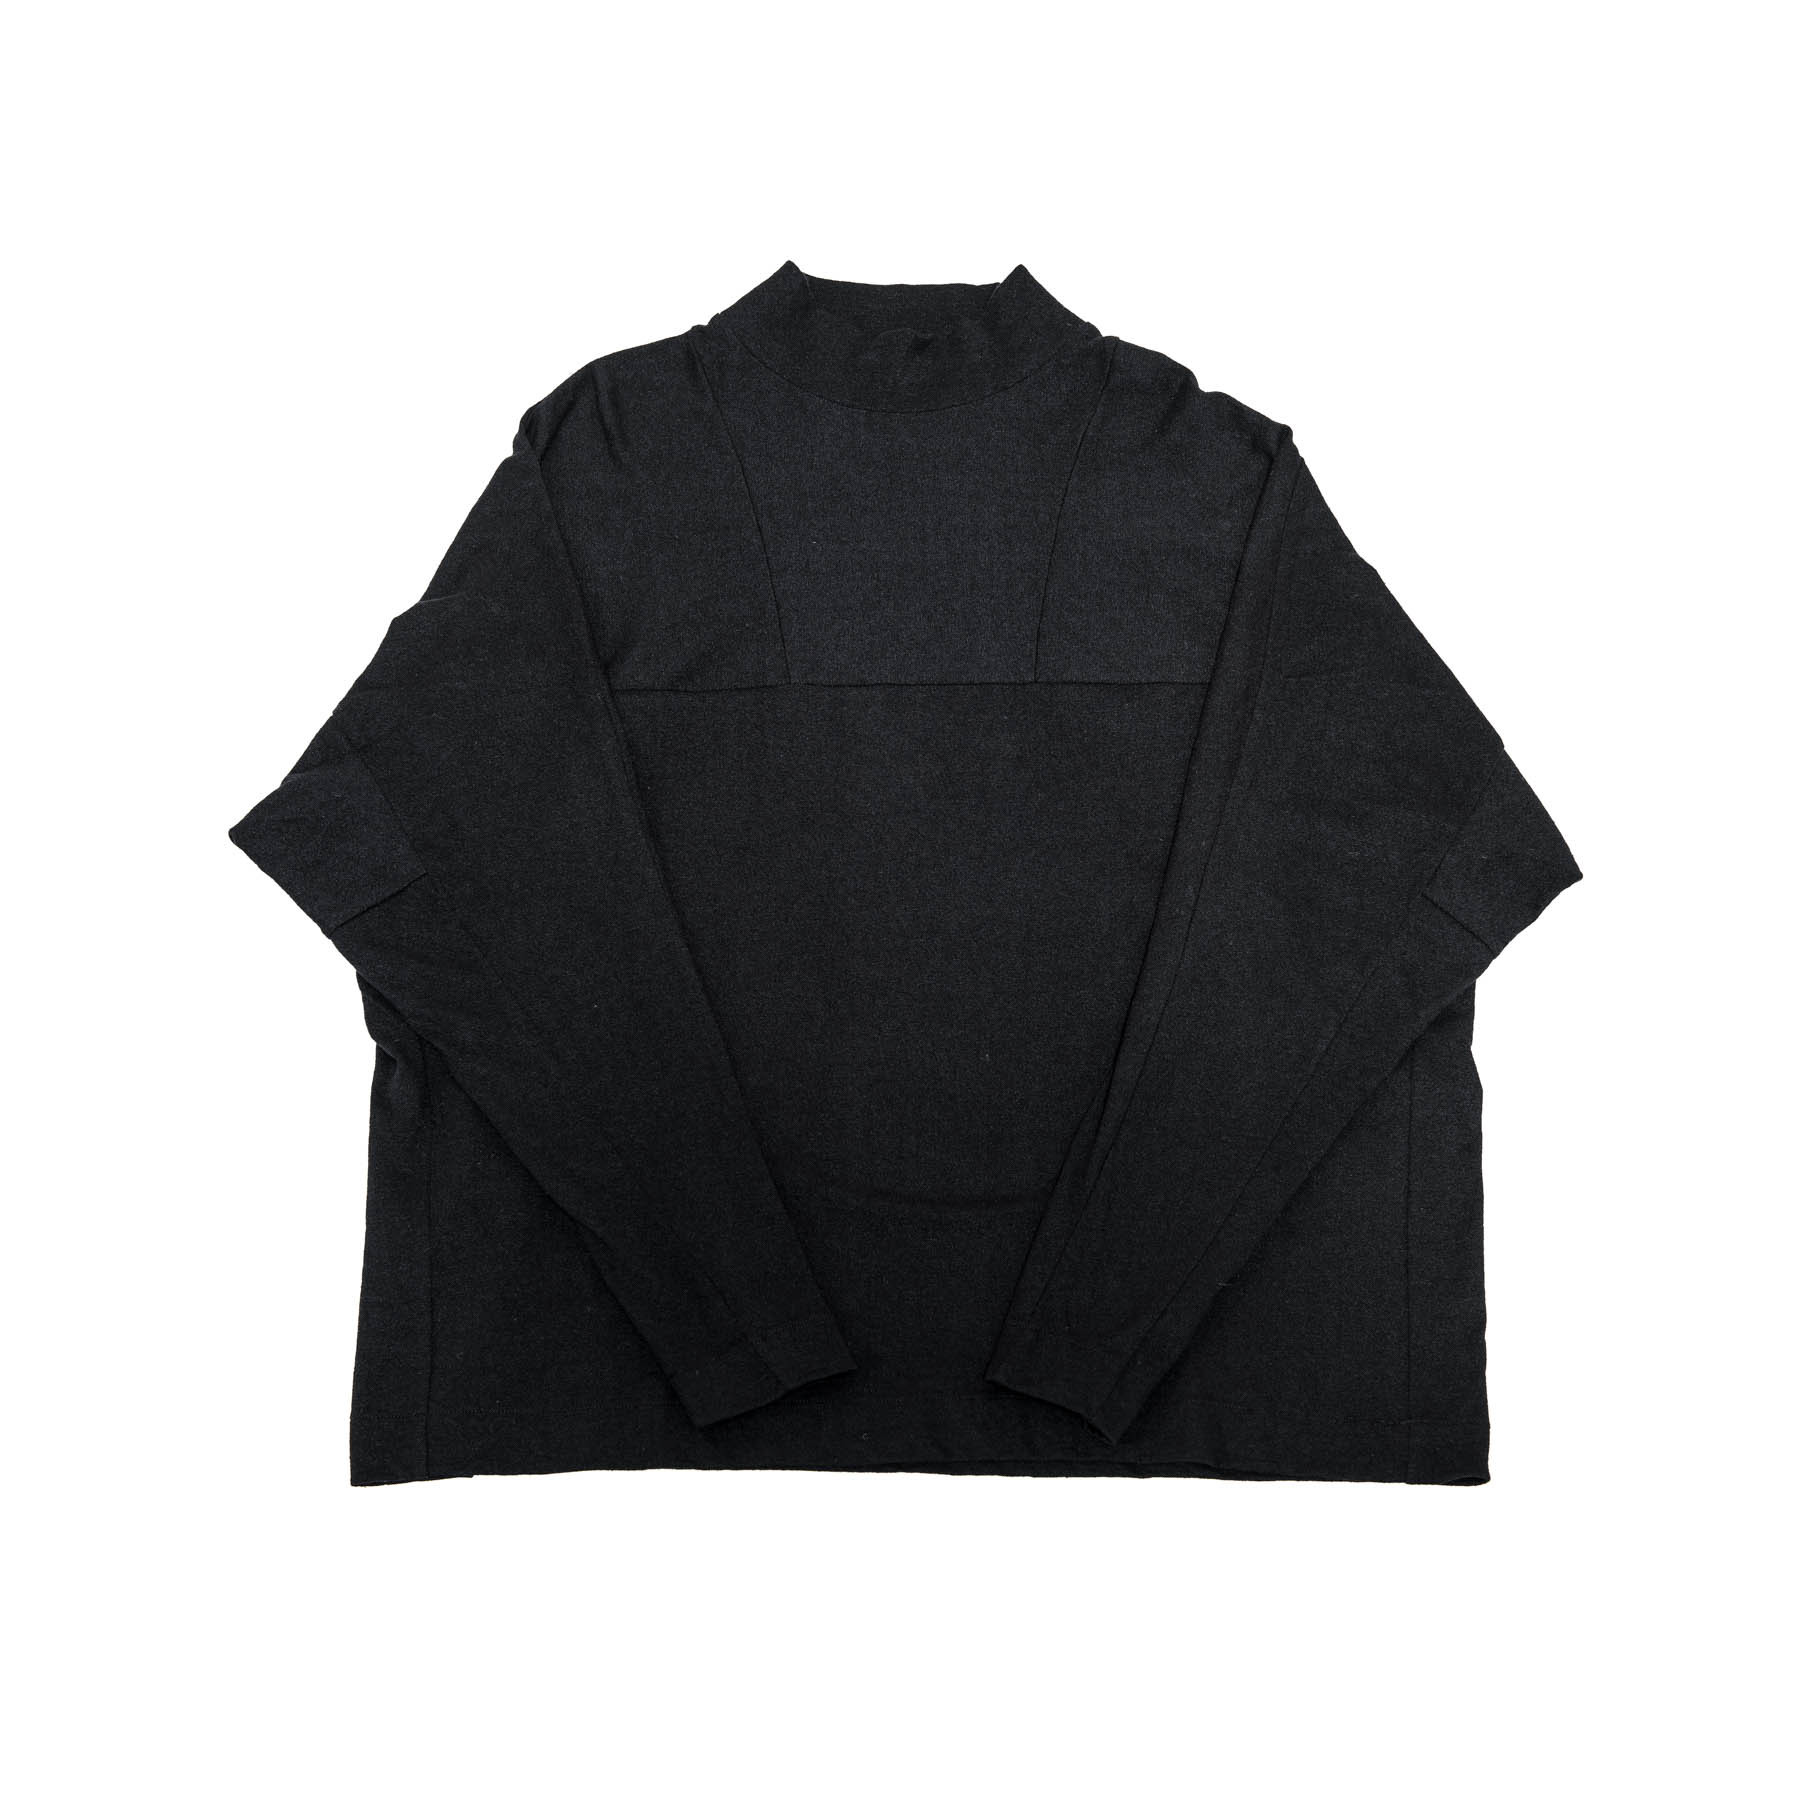 597CUM17-BLACK / シームドハイネックカットソー